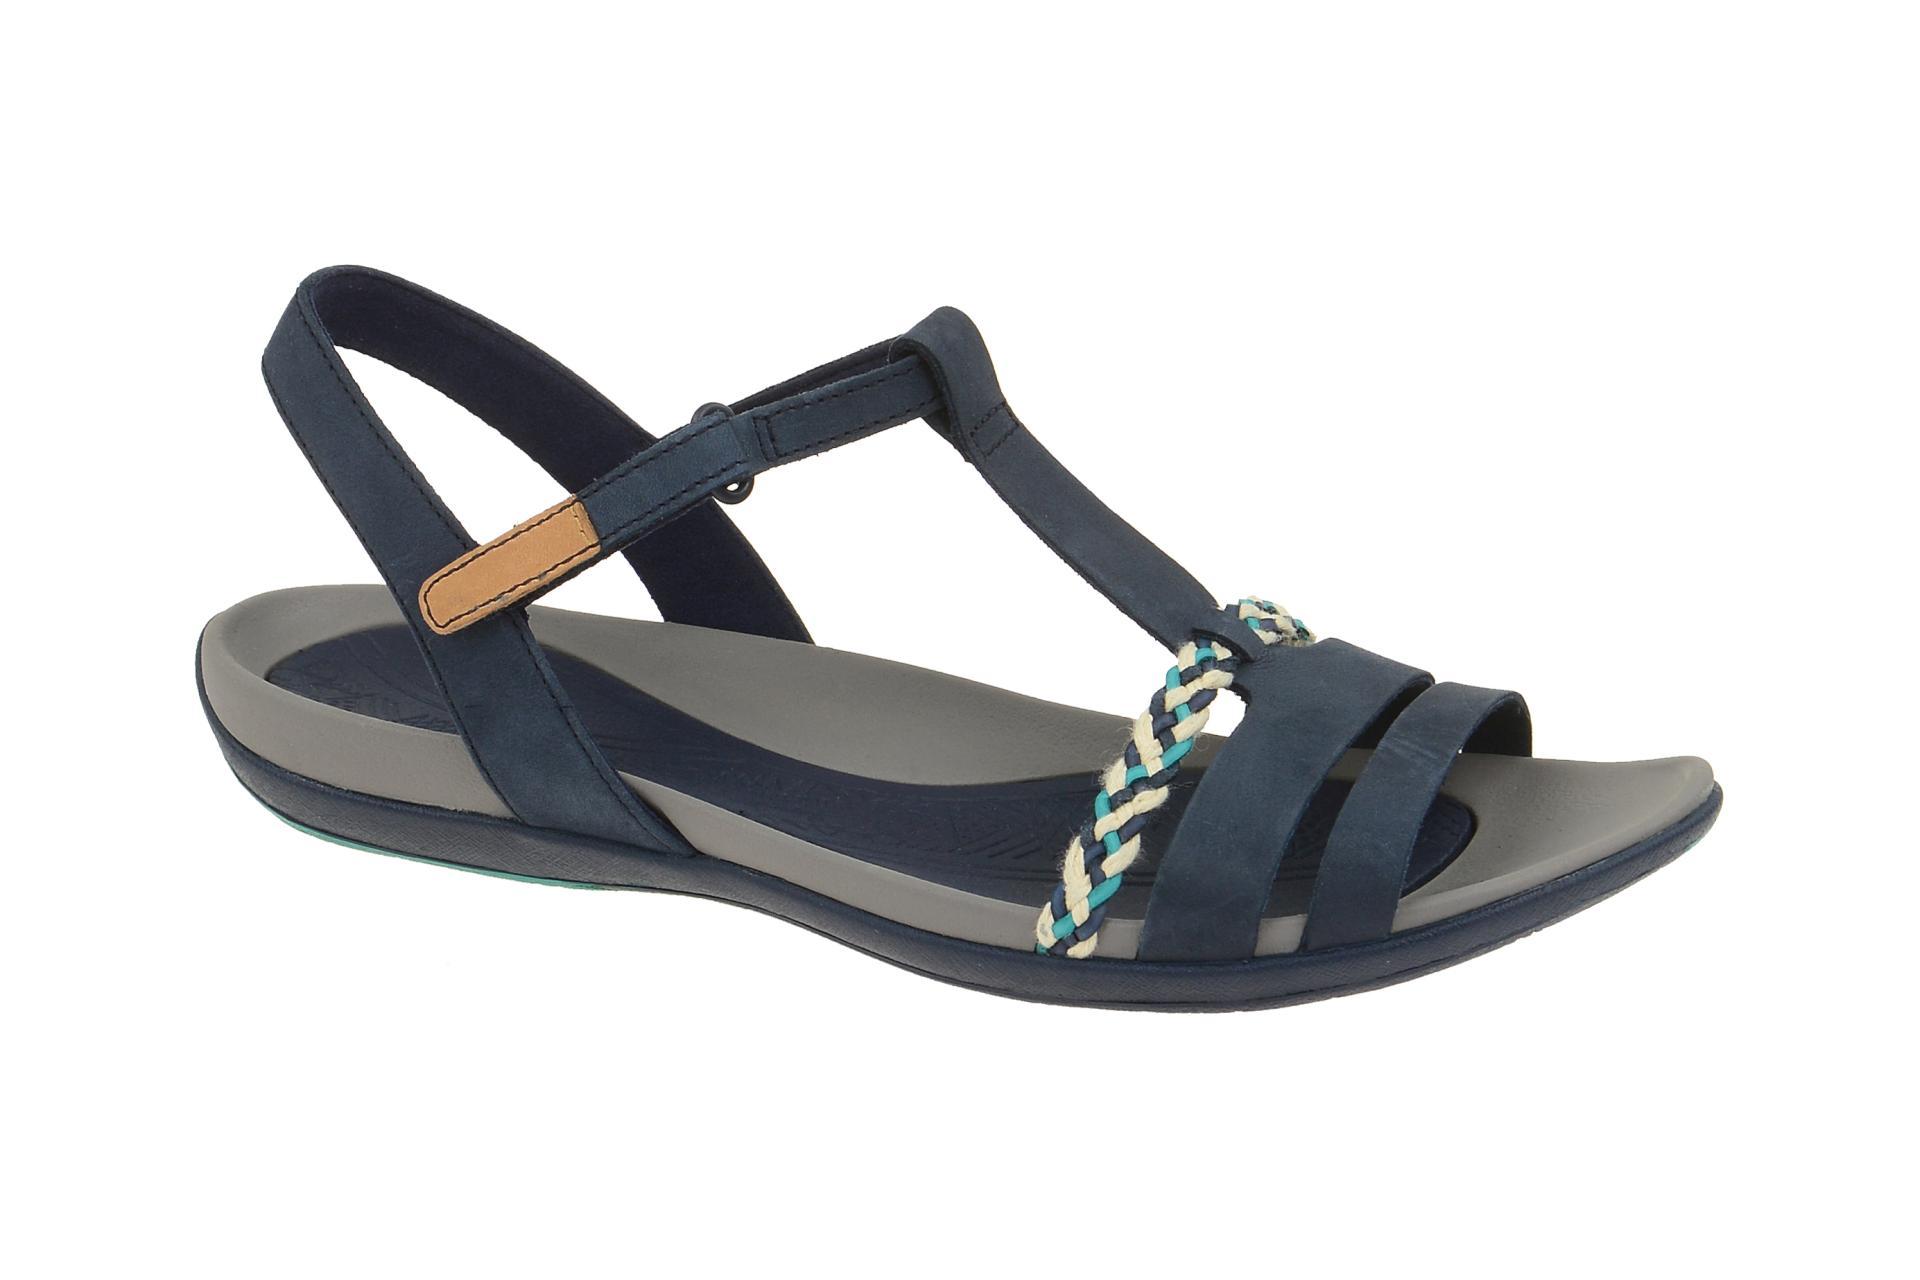 clarks tealite grace sandale blau - schuhhaus strauch shop